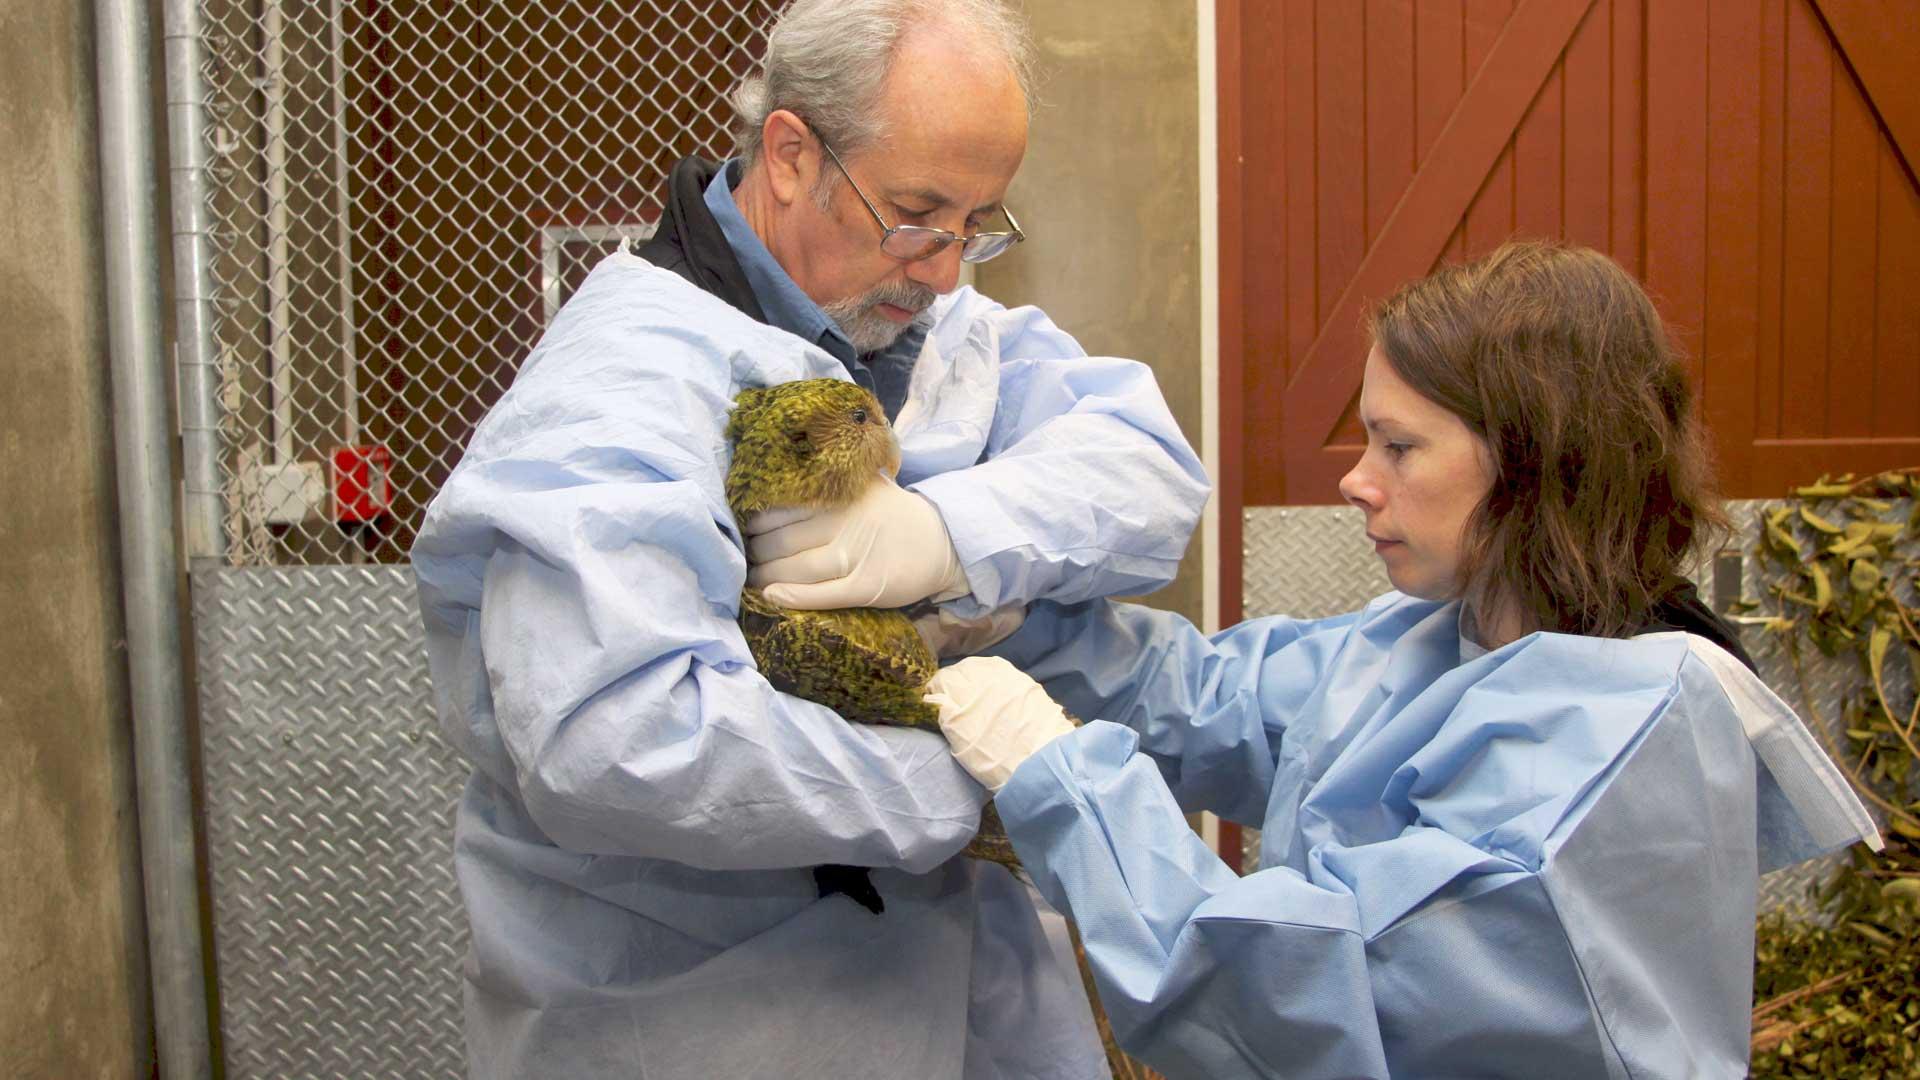 https://rfacdn.nz/zoo/assets/media/richard-kakapo-gallery-3.jpg